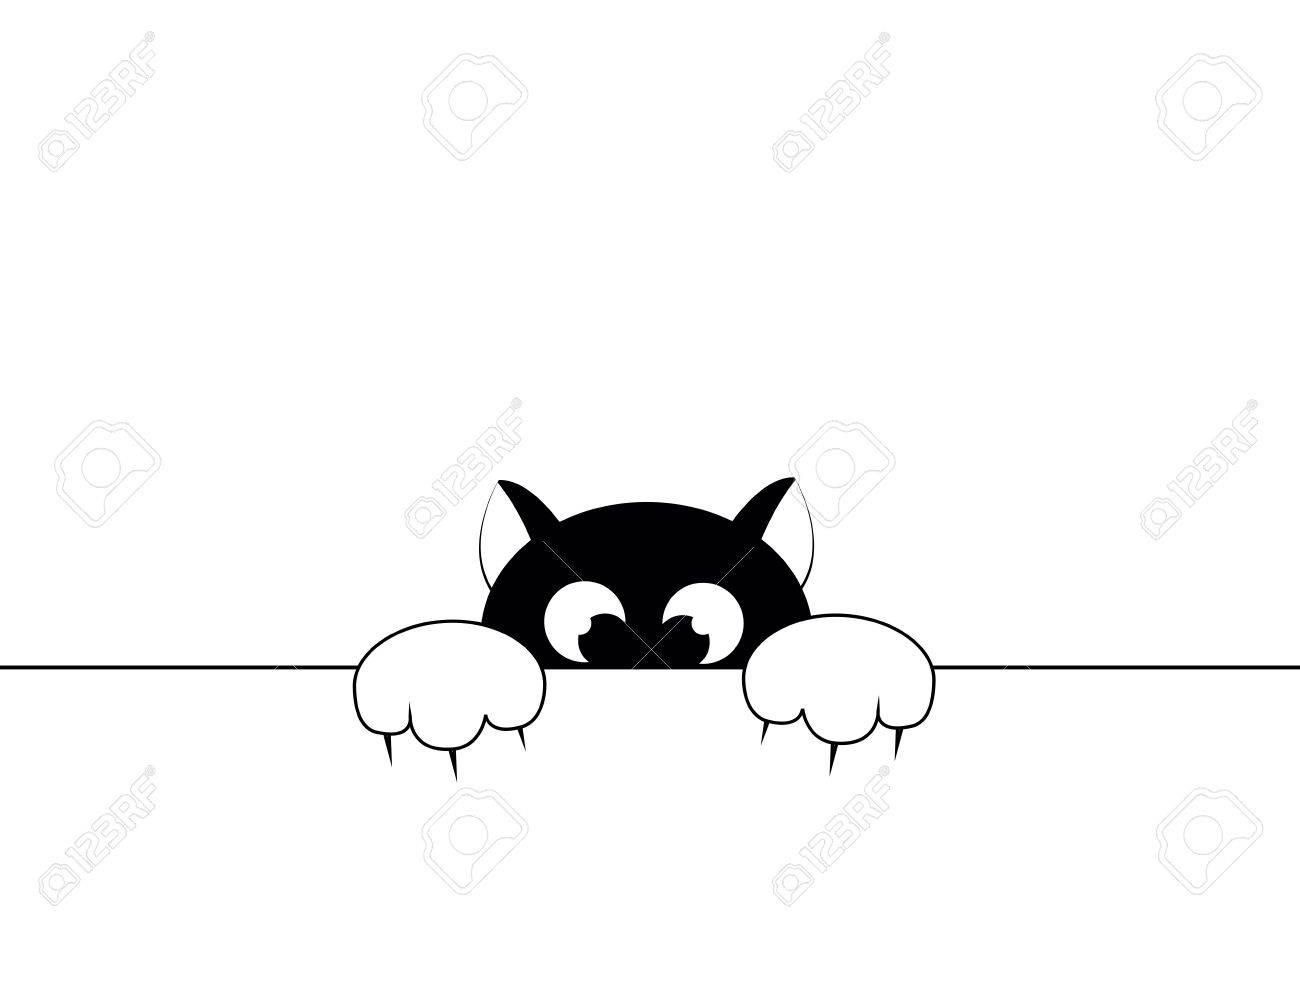 black smal cat is afraid of punishment Stock Vector - 16031460